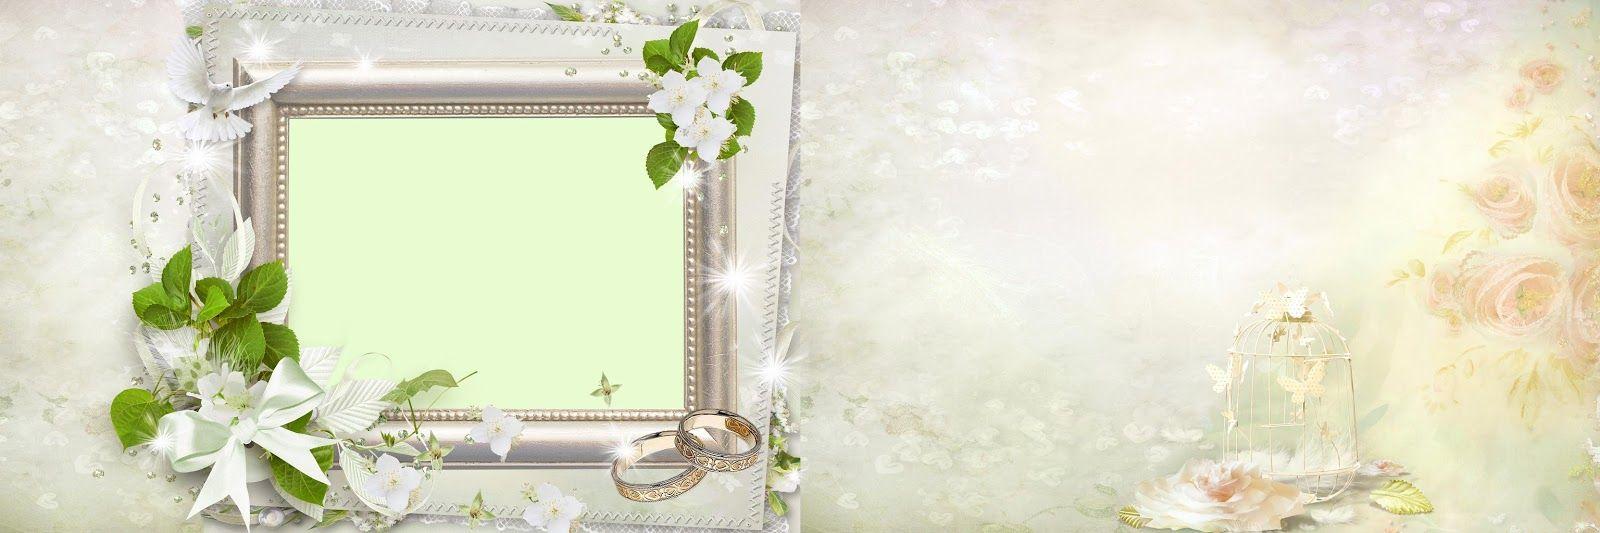 Karizma Album Design 12x36 With Flower Photo Frame Karizma Album